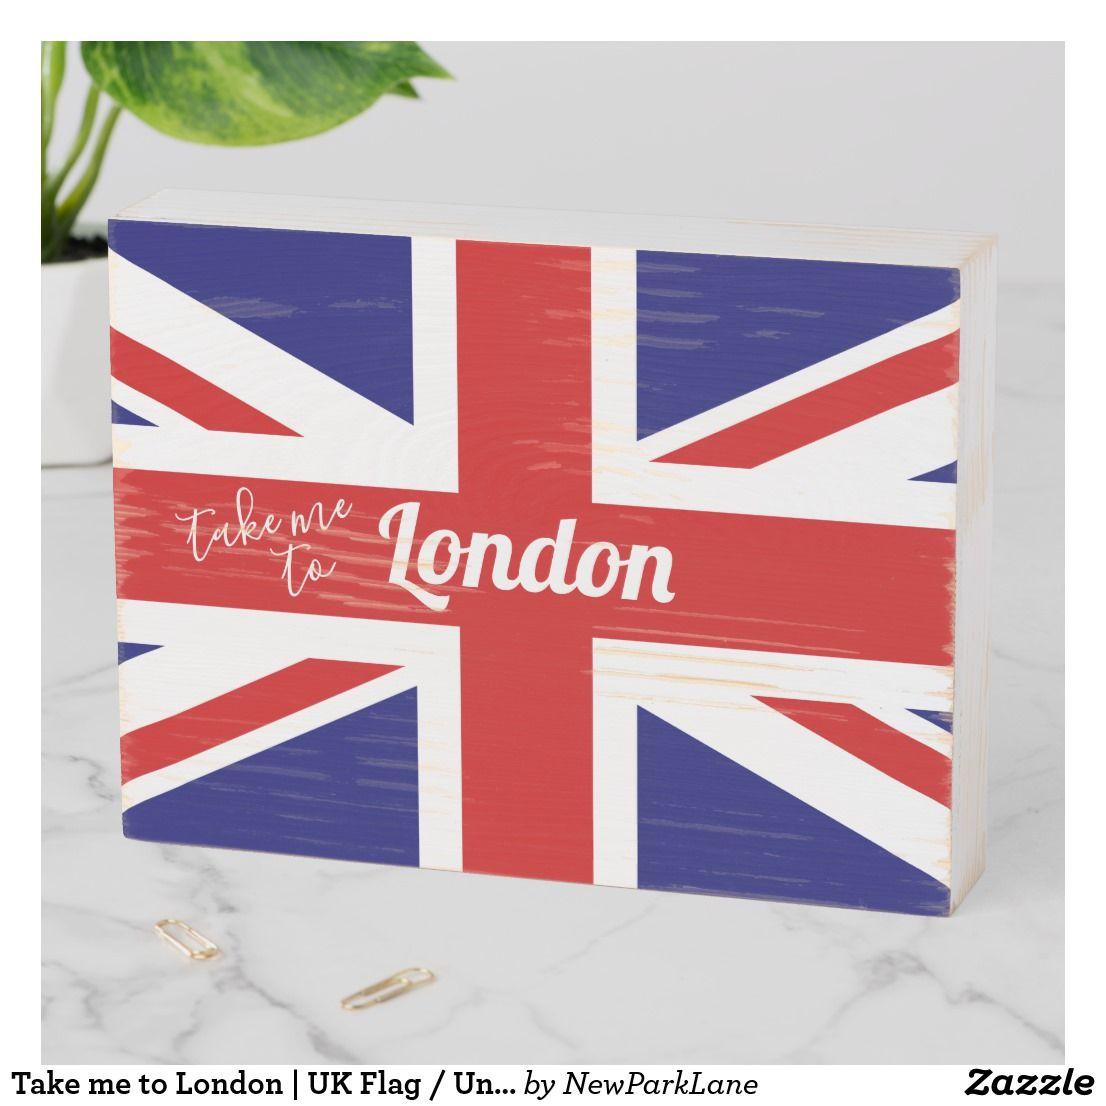 Take Me To London Uk Flag Union Jack Wooden Box Sign Zazzle Com In 2020 Uk Flag London Sign Box Signs